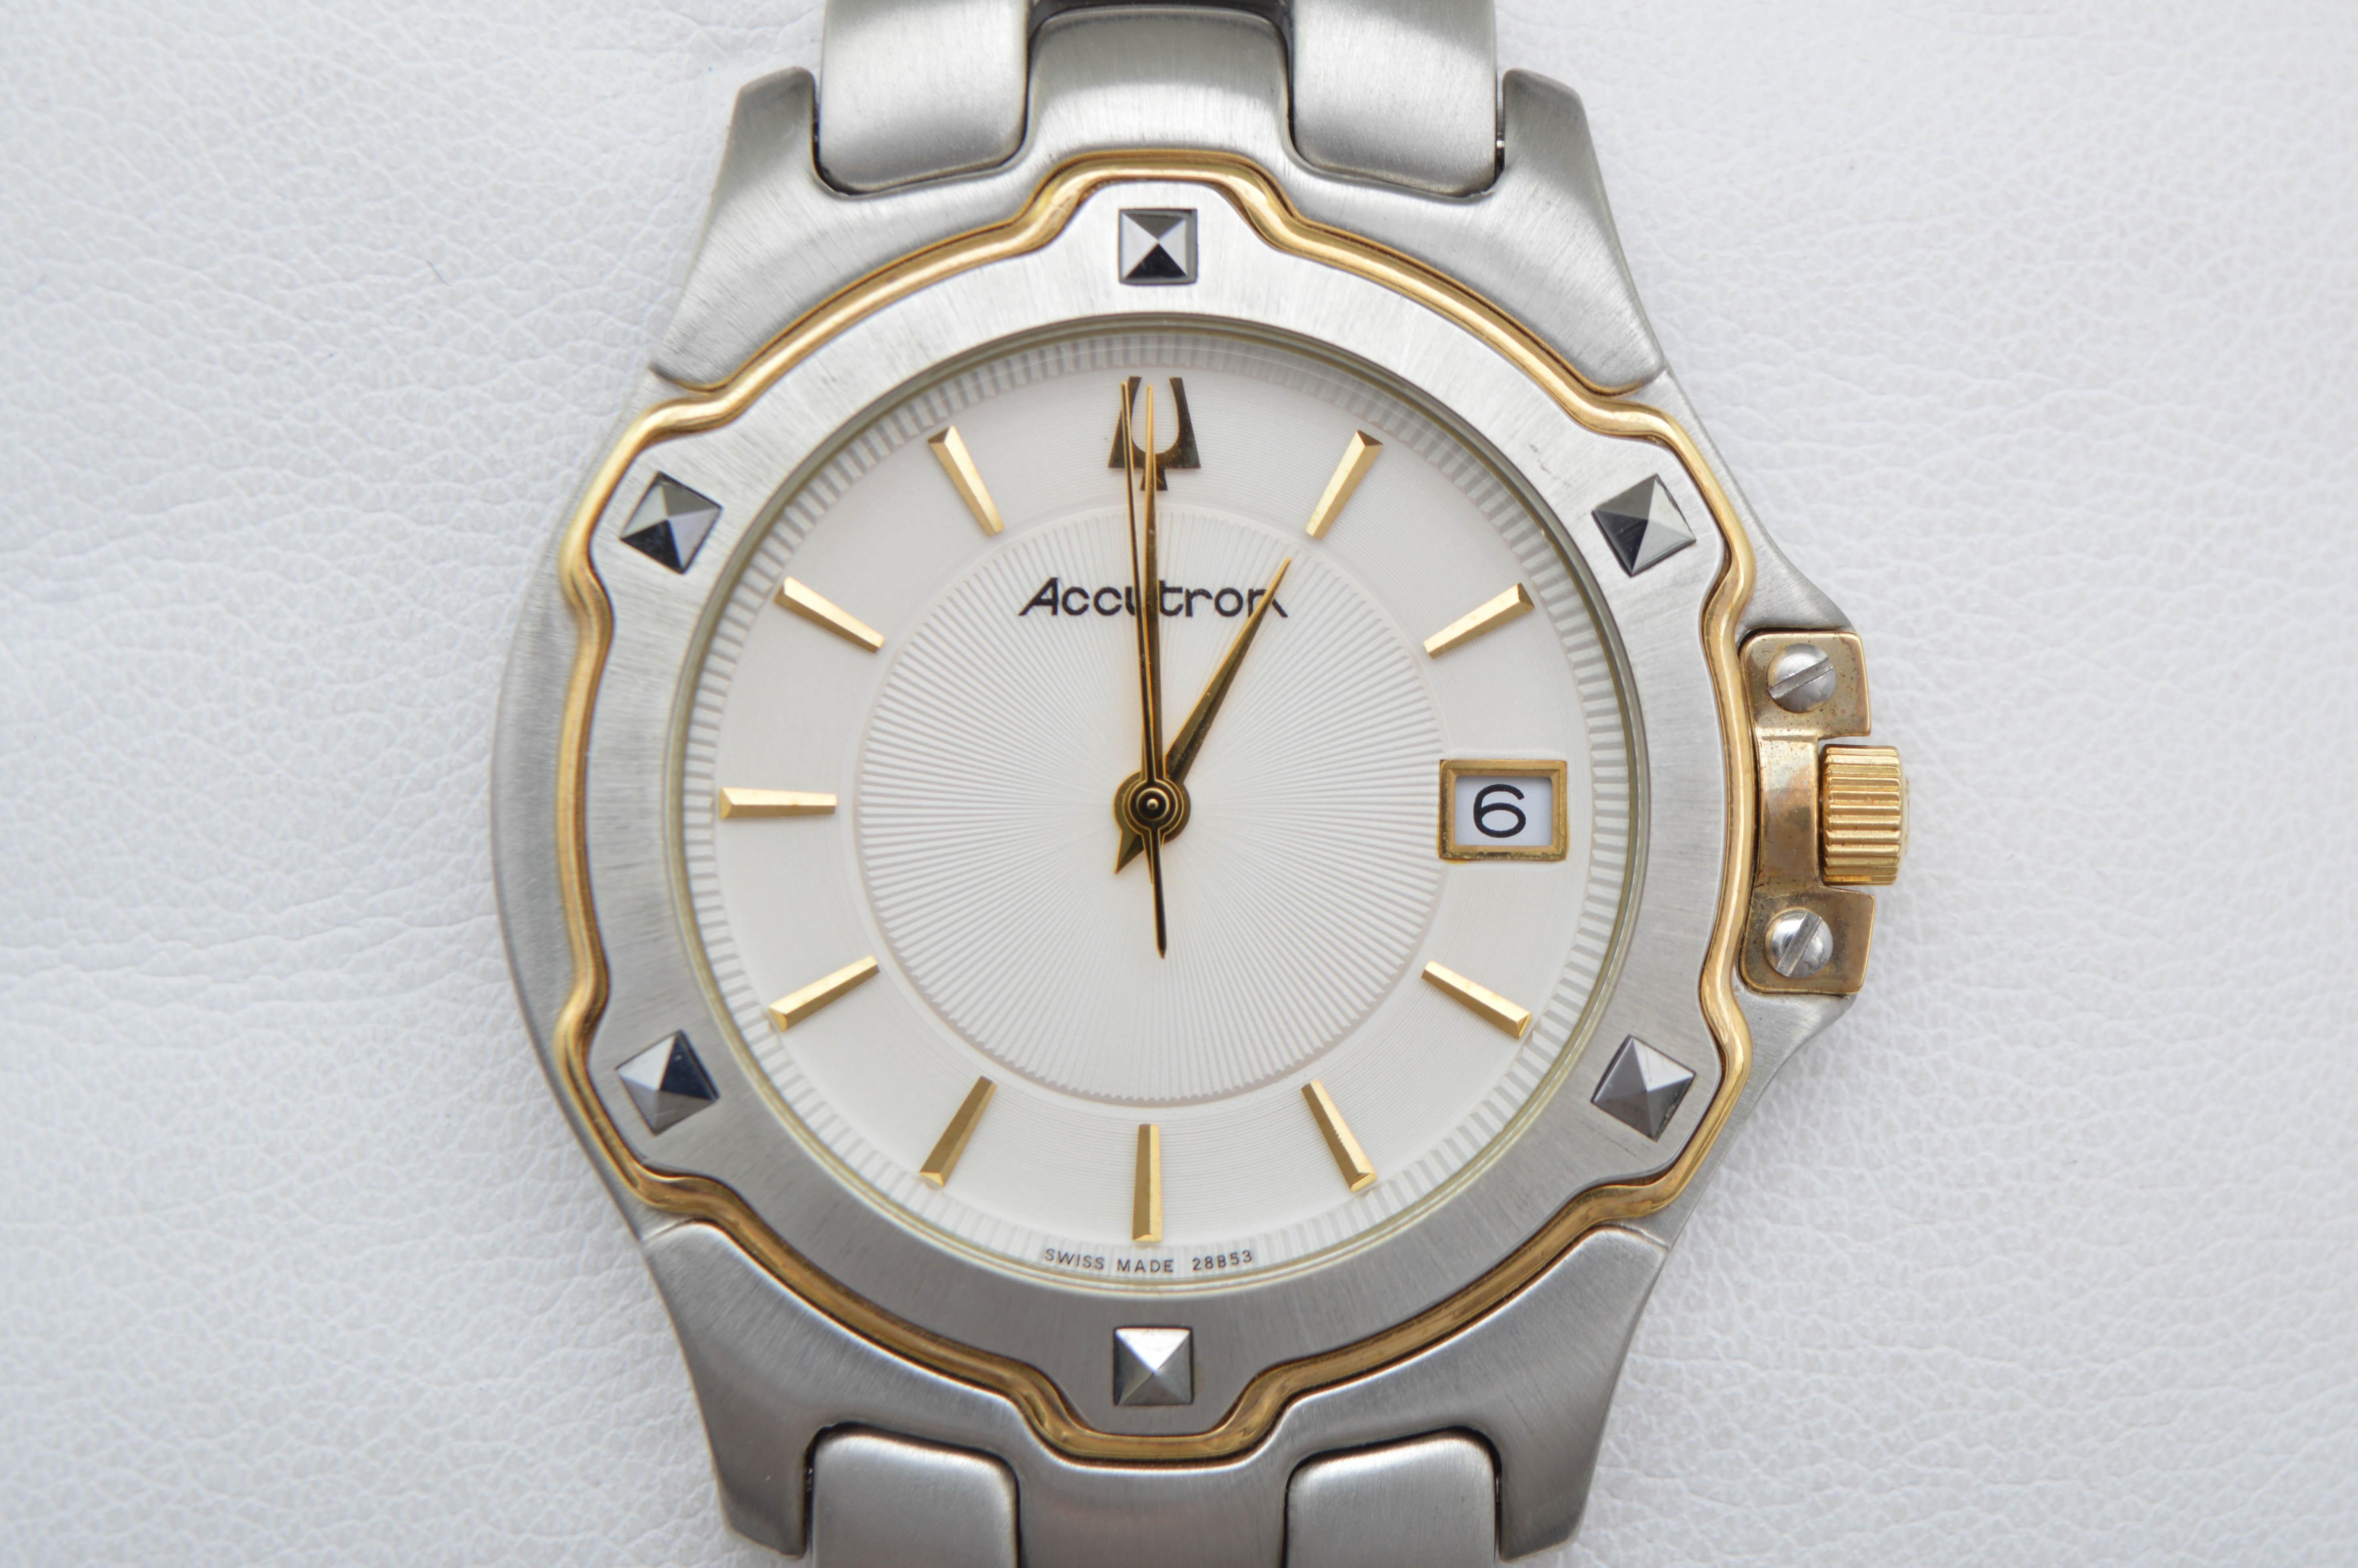 Men's Accutron by Bulova Wristwatch New in Box